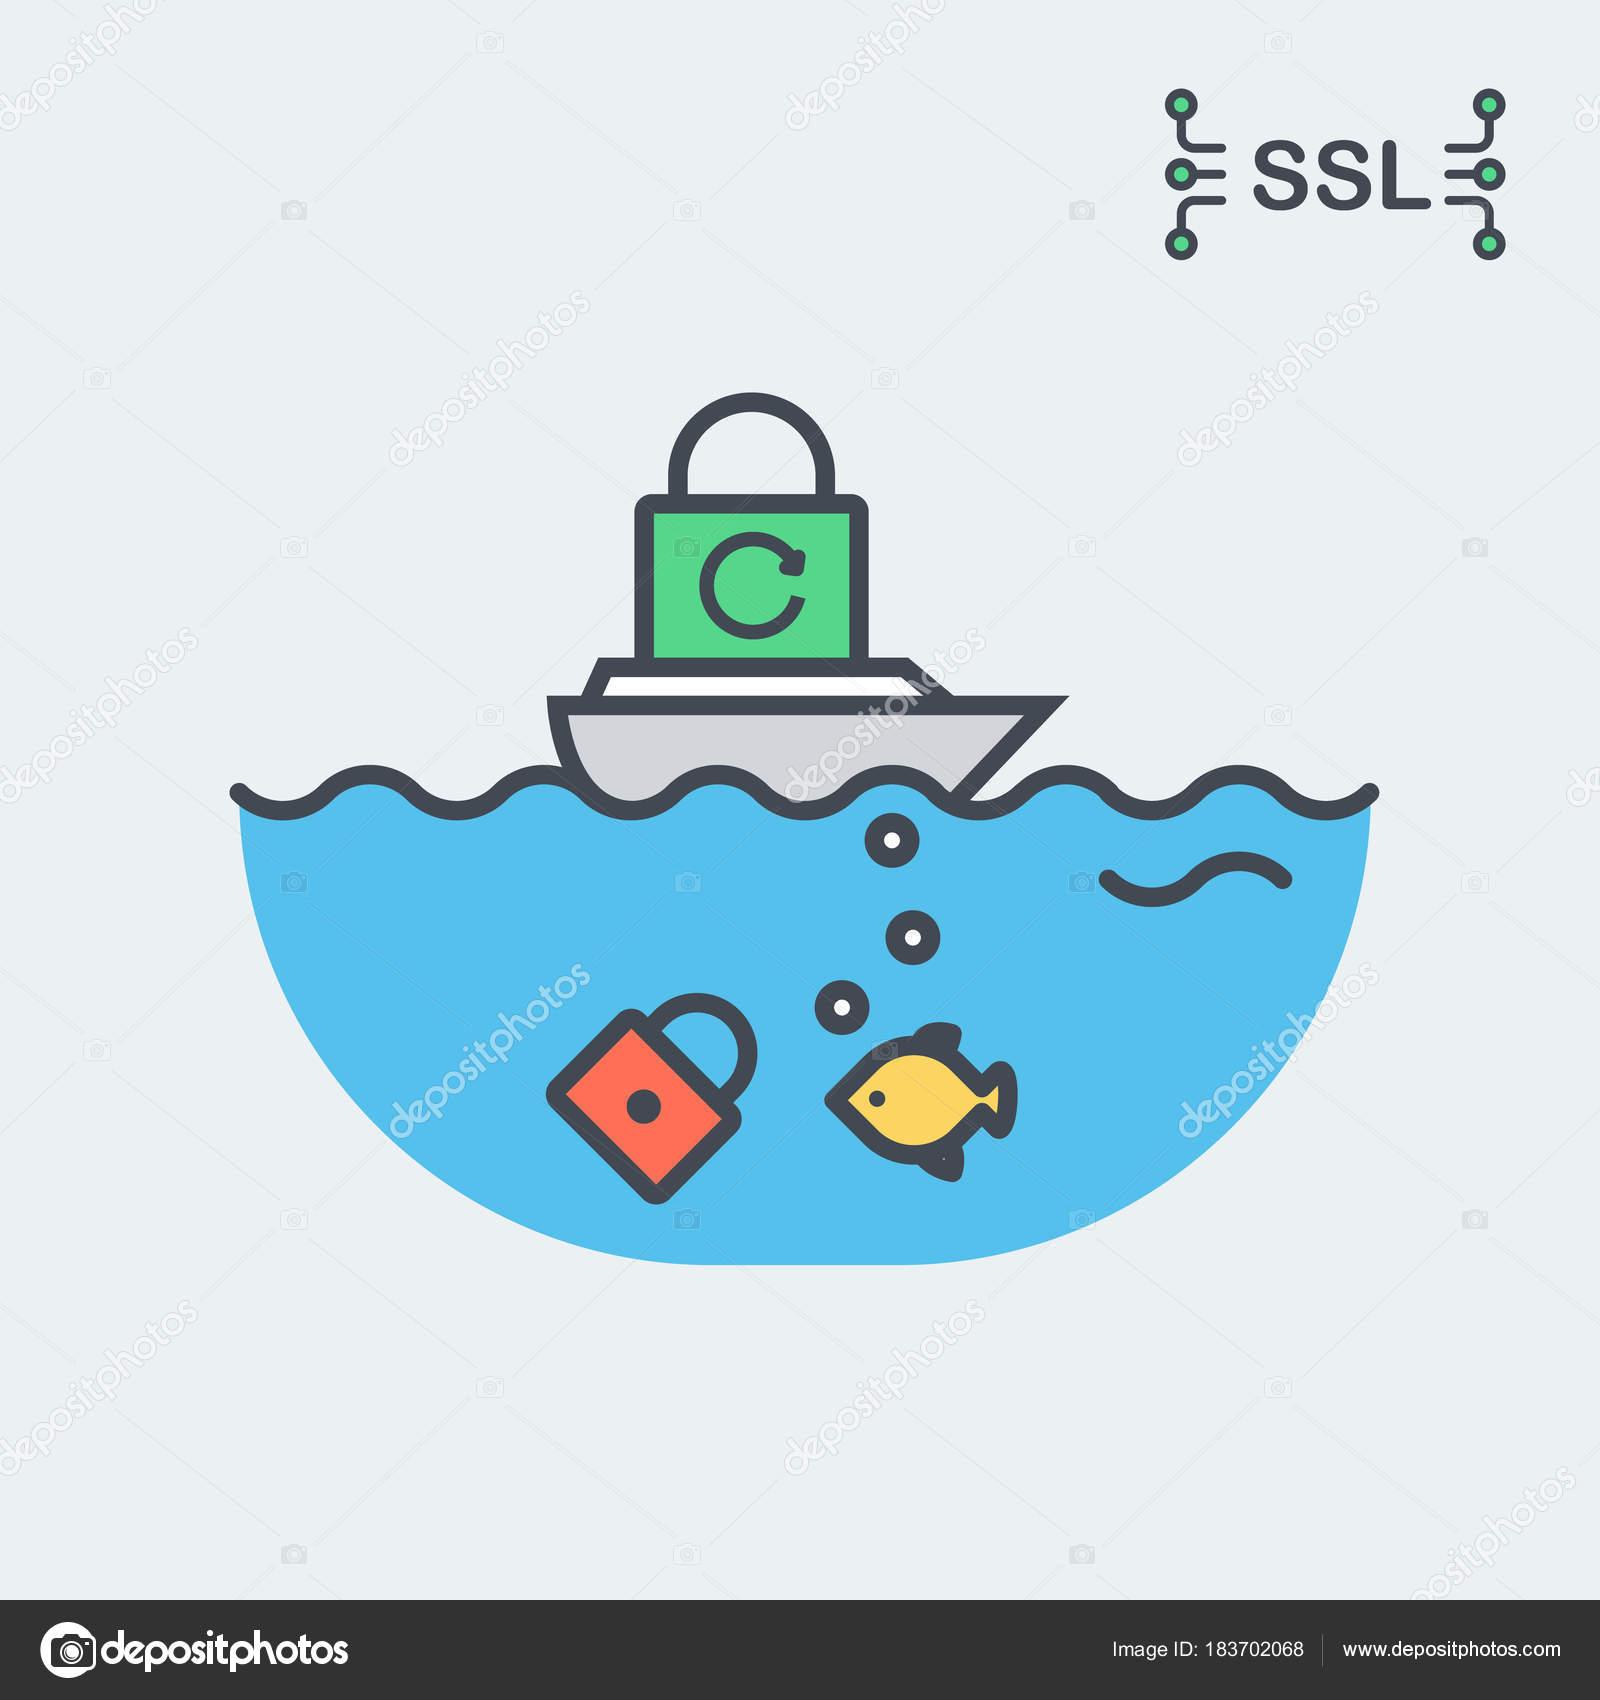 Conceptual Ssl Or Tls Certificate Illustration Stock Vector